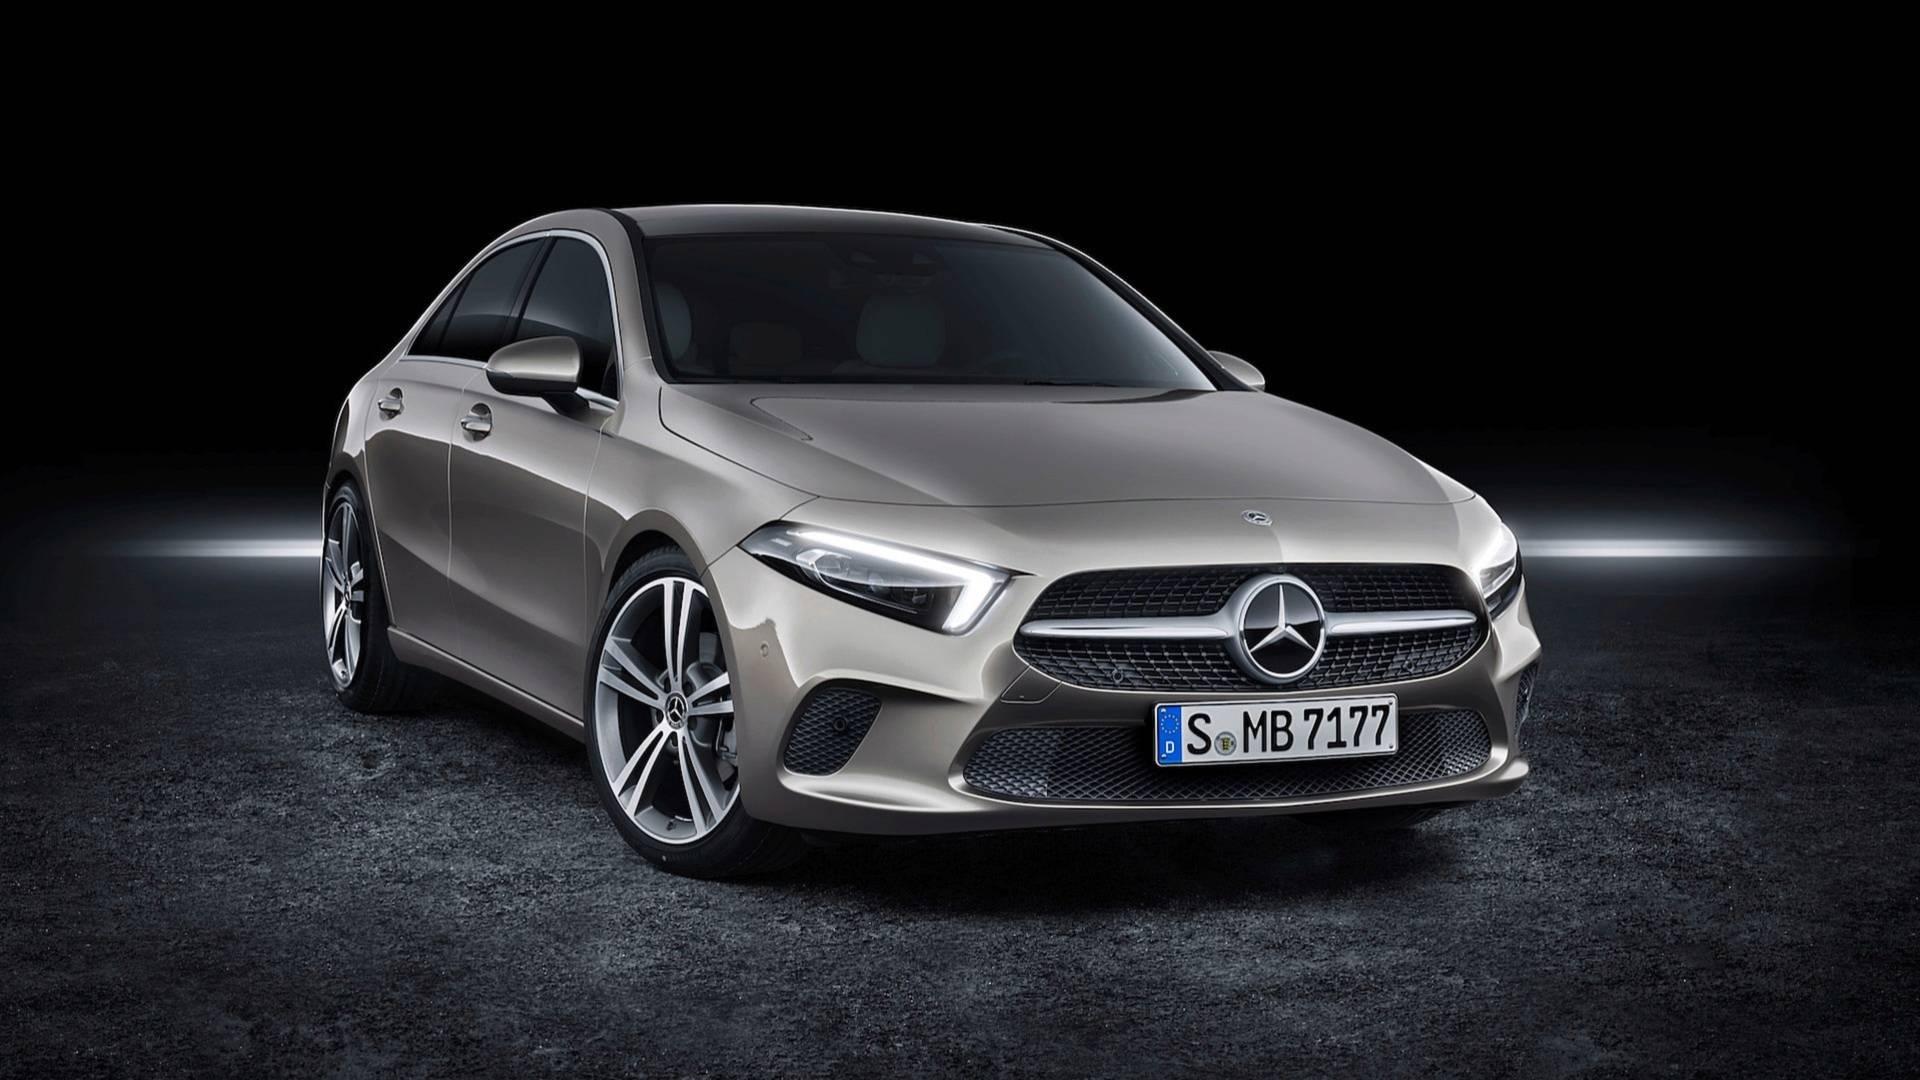 2019 Mercedes-Benz A-Class Sedan (V177) is Far More Elegant Than Hatchback - autoevolution